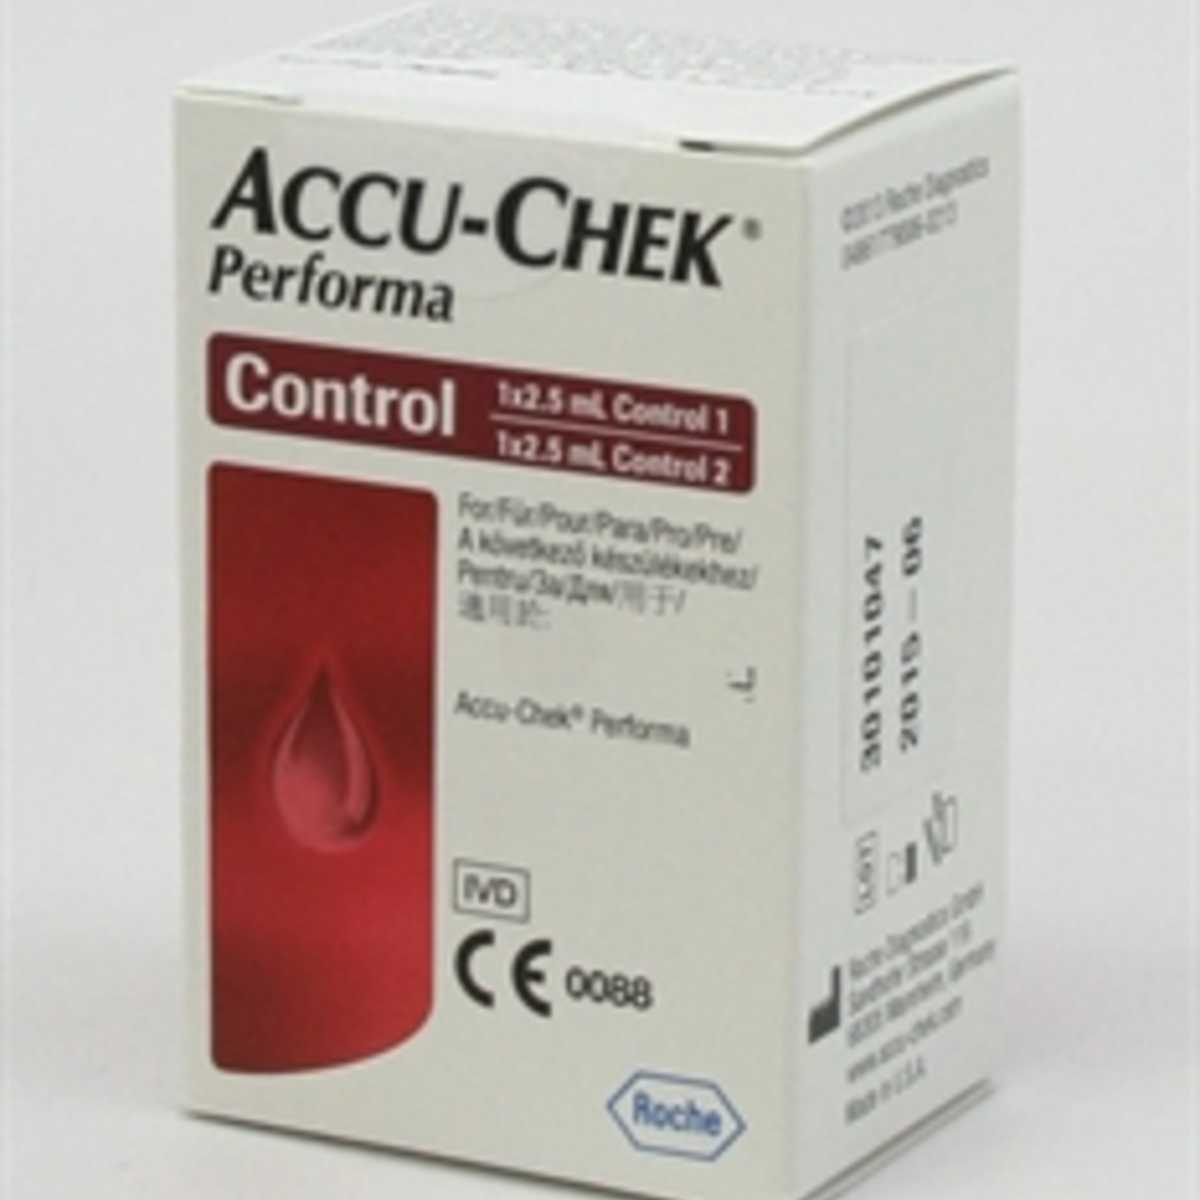 Accu-Chek Performa Control Solution